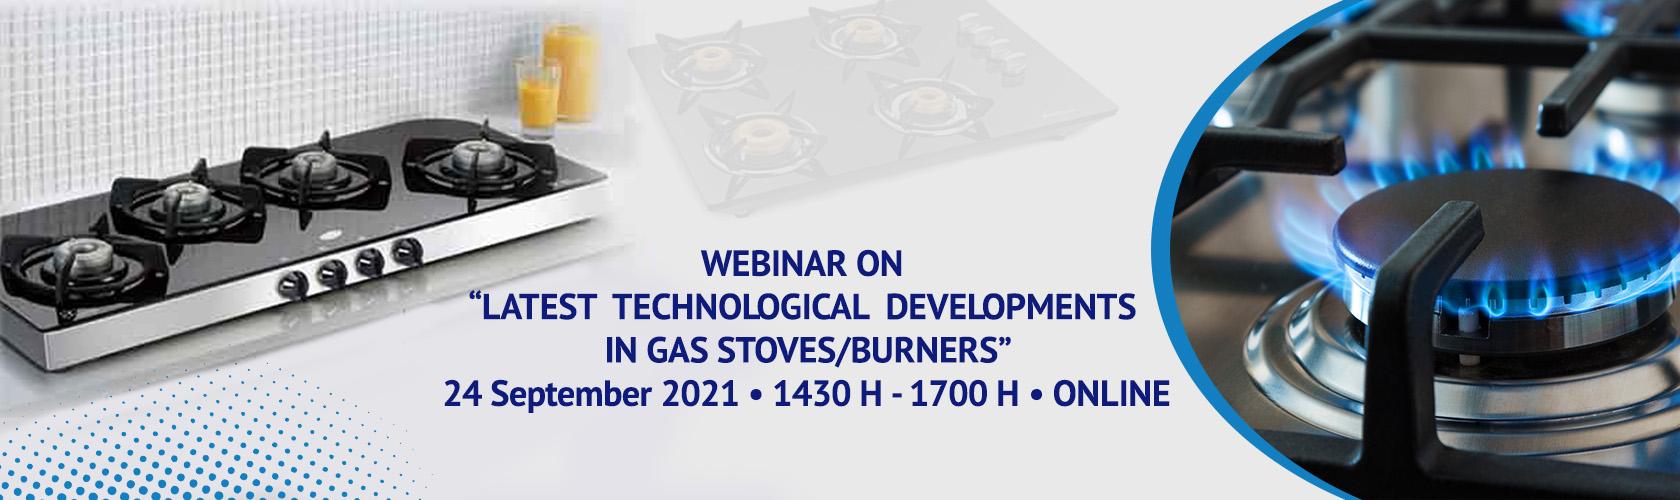 488139151Latest Technologies Development-24 webinar